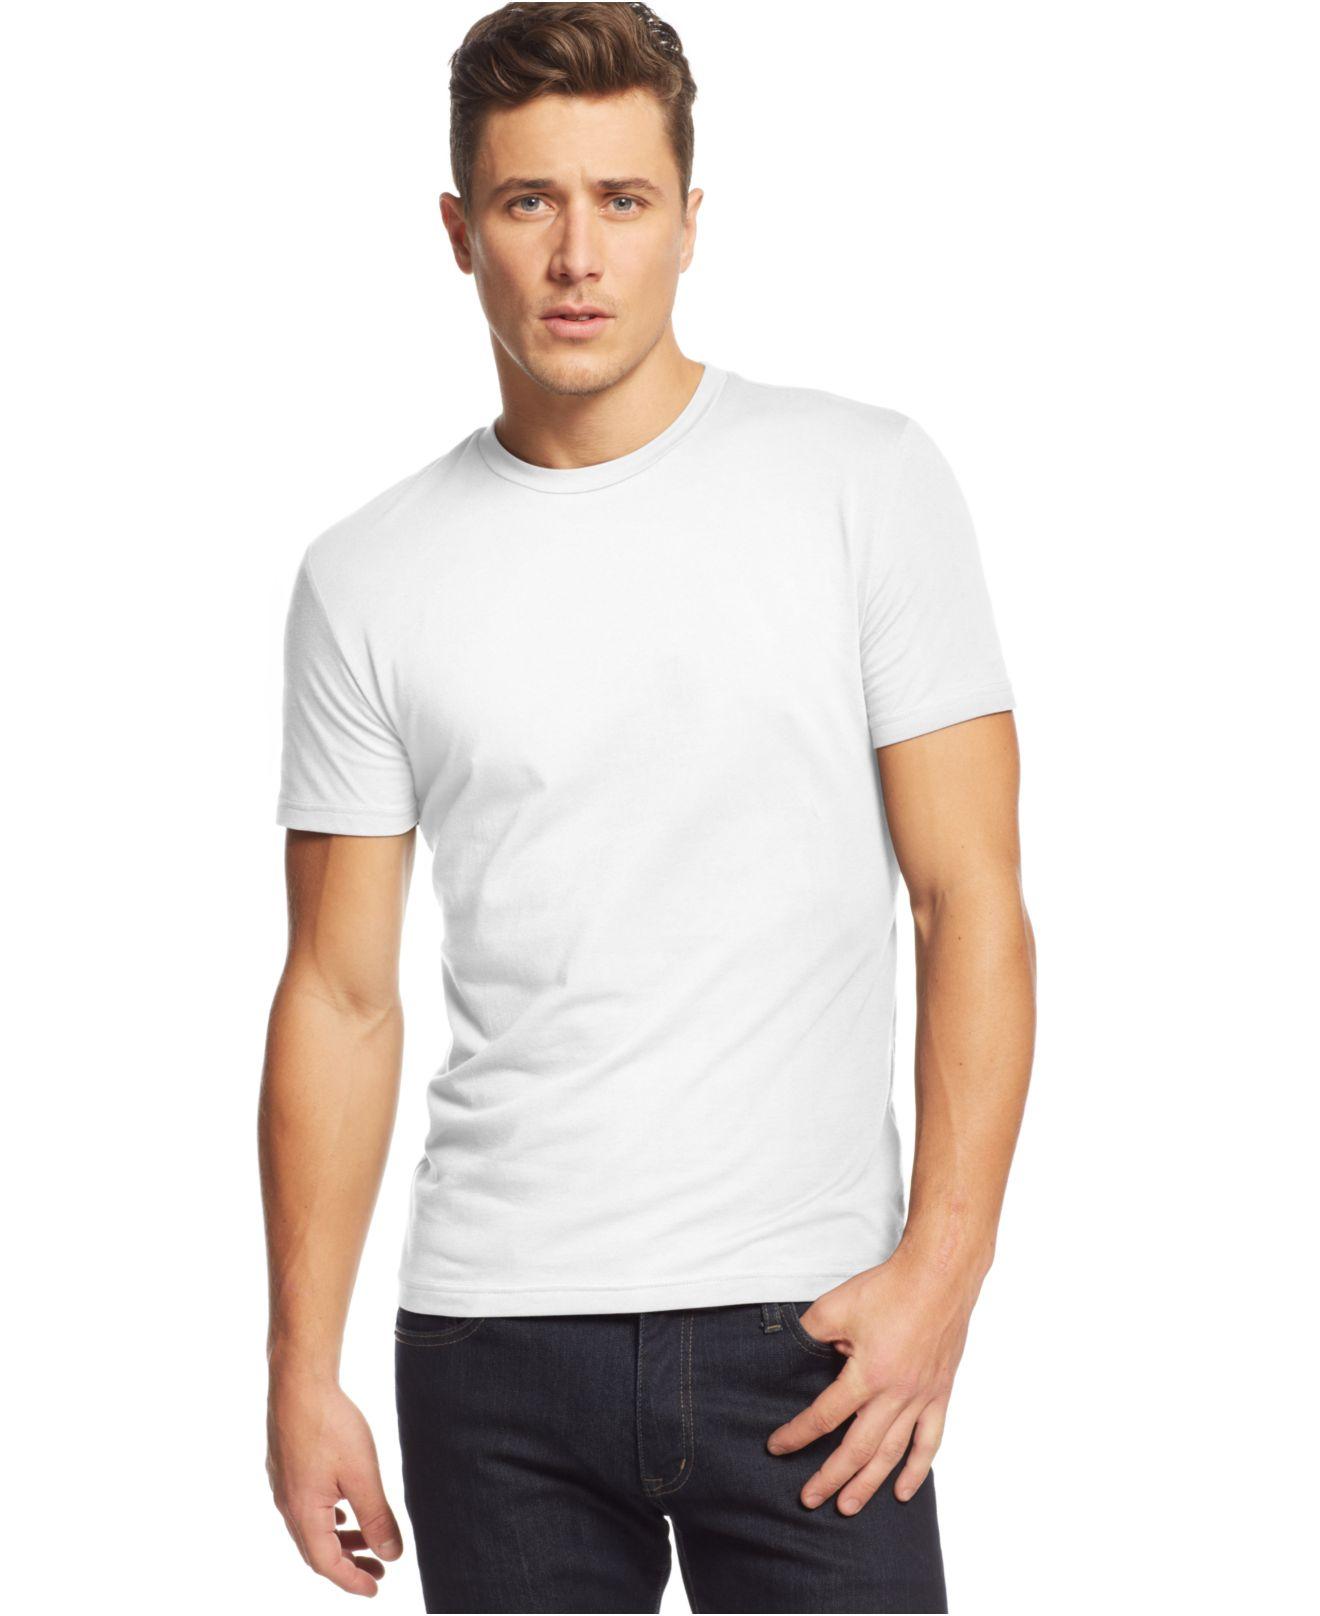 Alfani slim fit crewneck t shirt in white for men lyst for Slim fit white t shirt